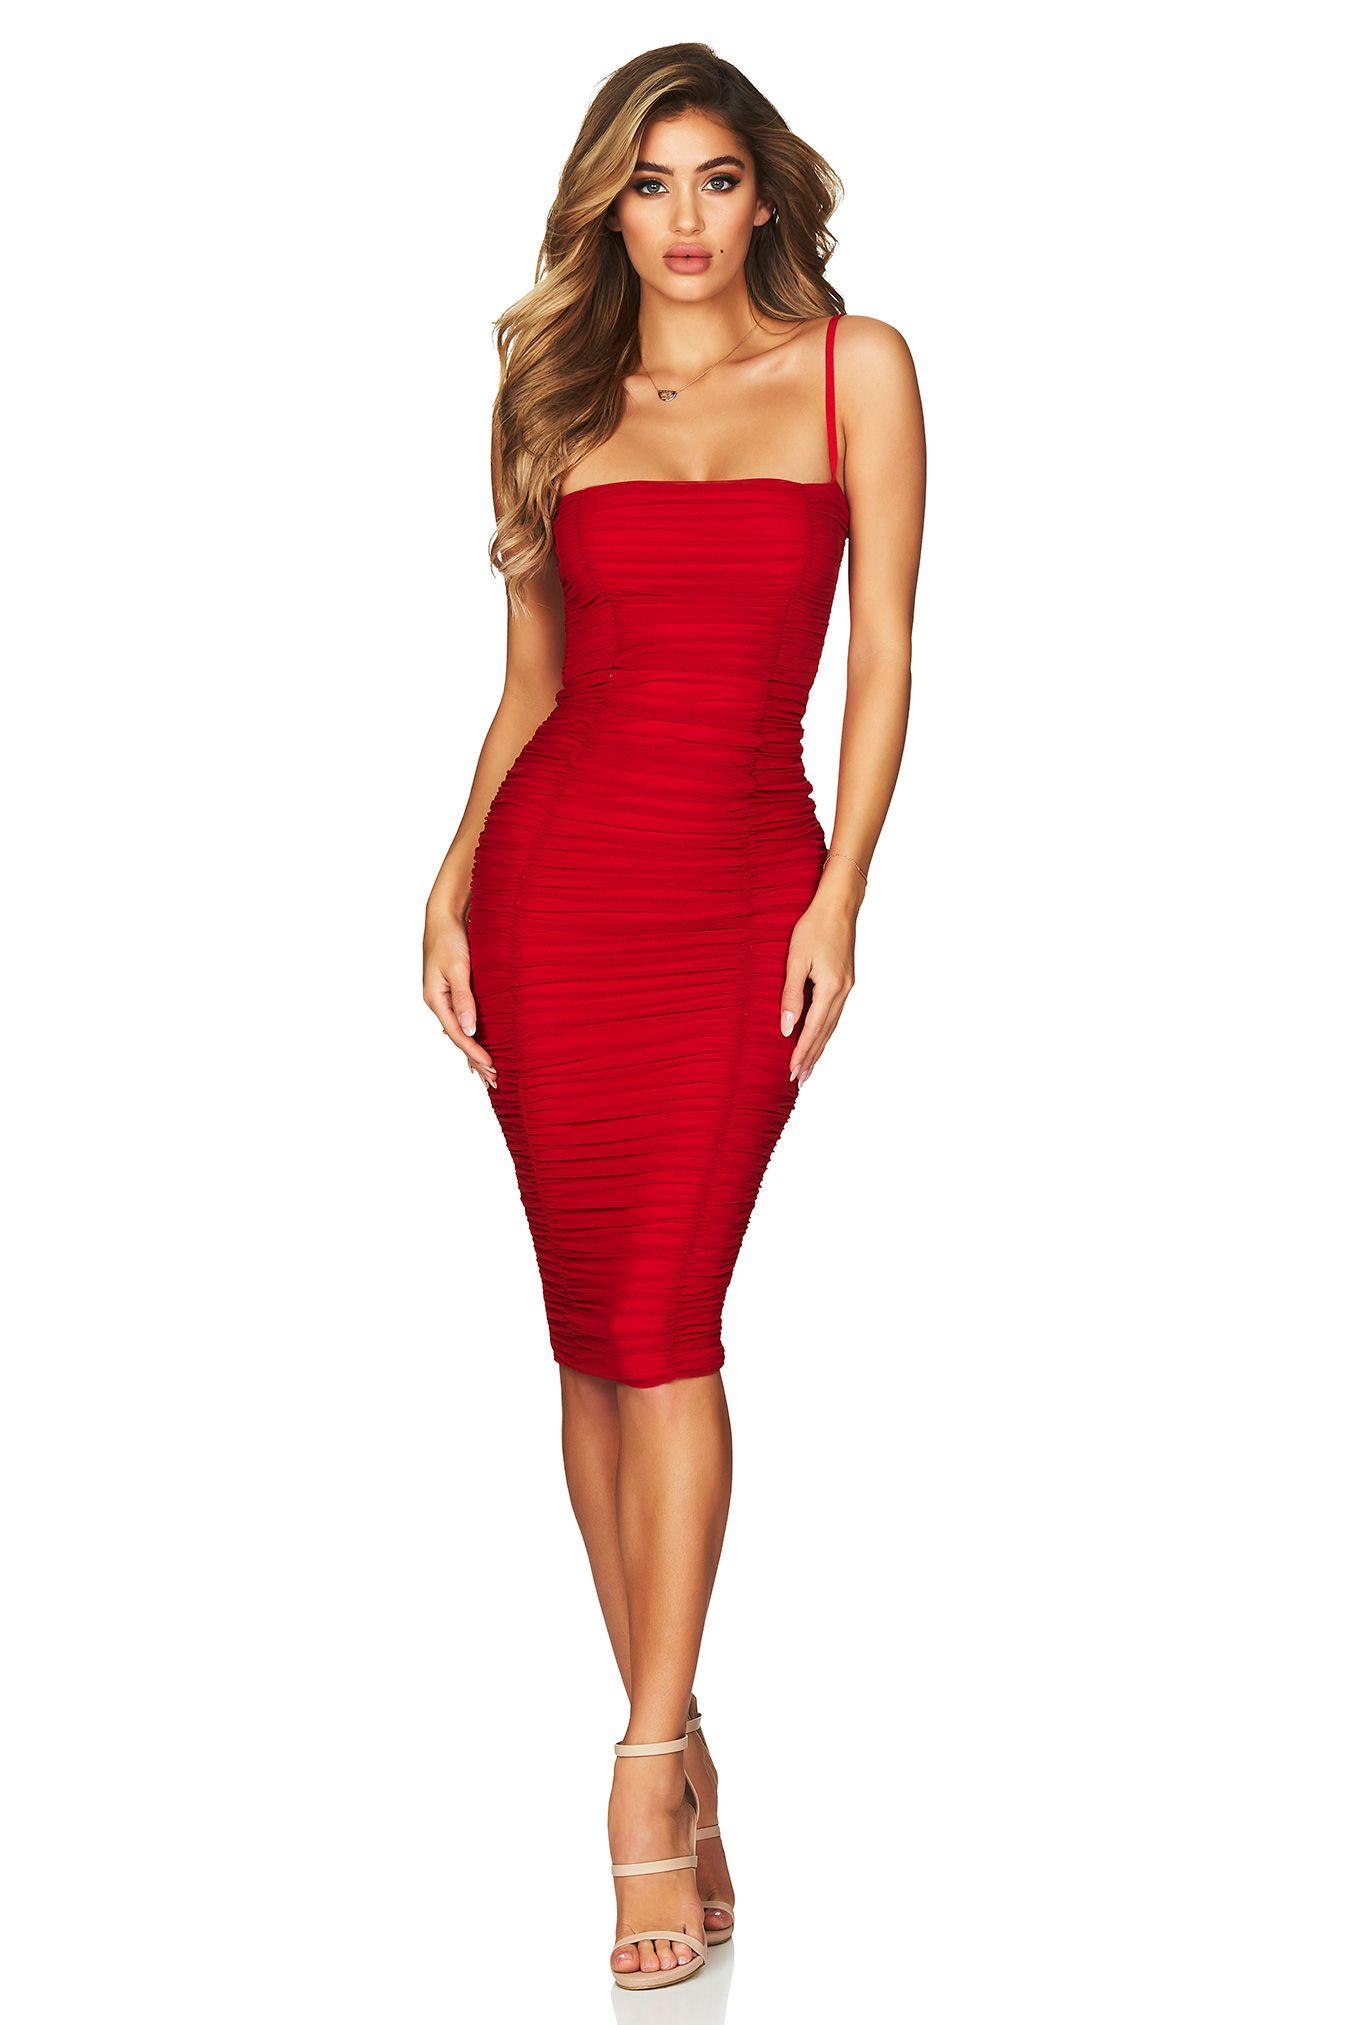 28726ff7bf424 Black Mystic Mesh Midi : Buy Designer Dresses Online at Nookie ...